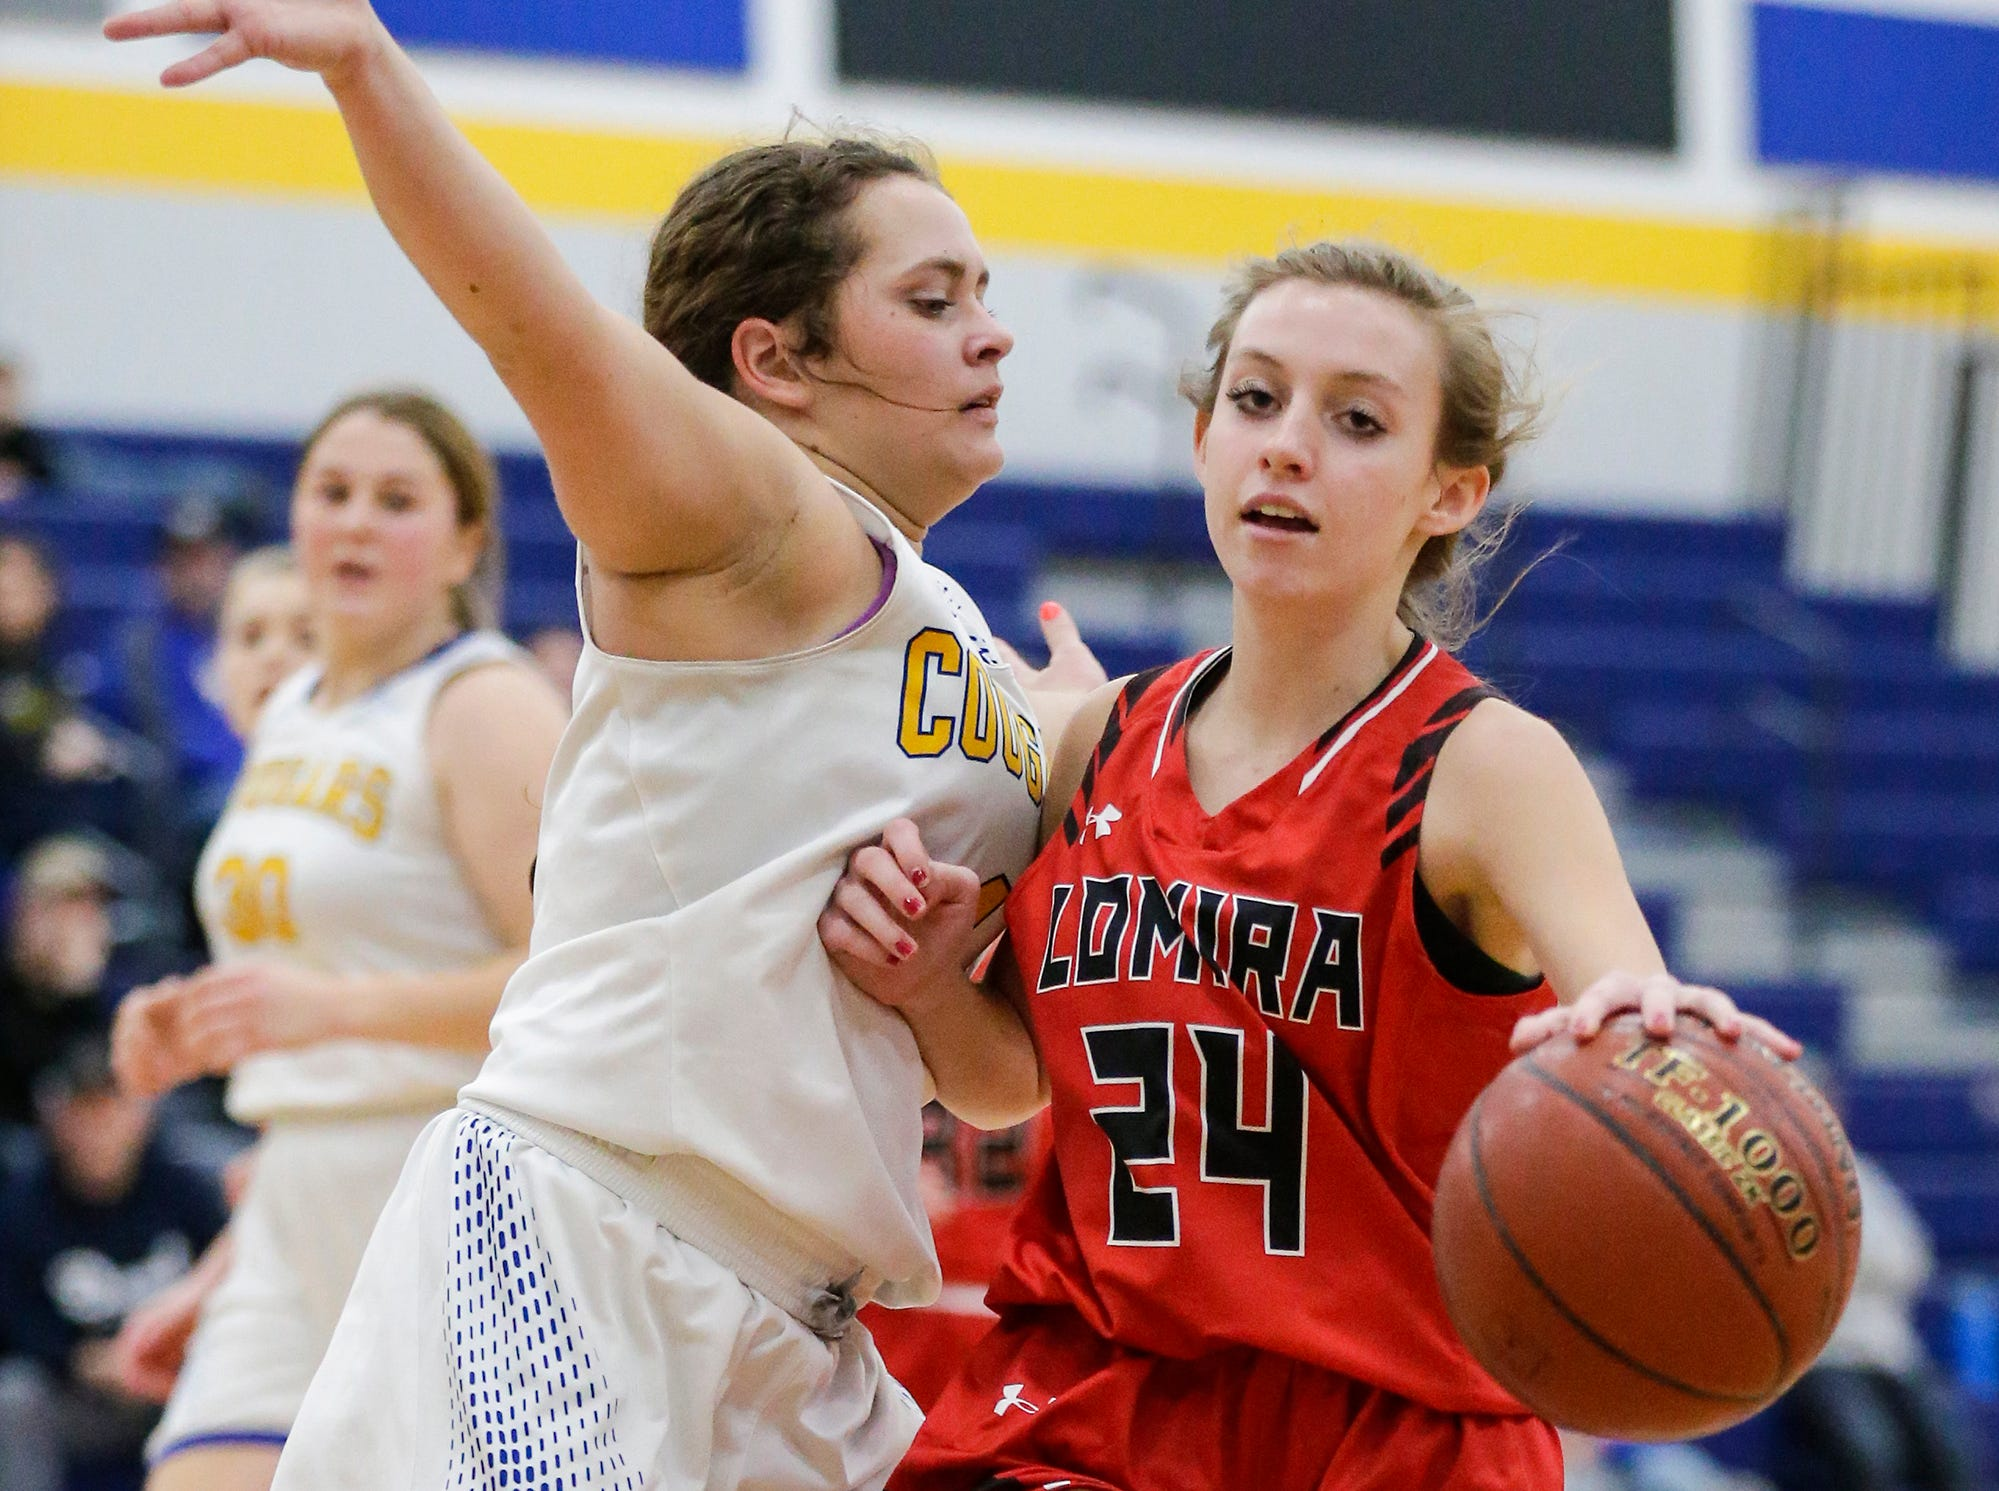 Lomira High School girls basketball's Kailin Brath attempts to get around Campbellsport High School's Evonna Engel during their game Friday, December 28, 2018 in Campbellsport. Doug Raflik/USA TODAY NETWORK-Wisconsin